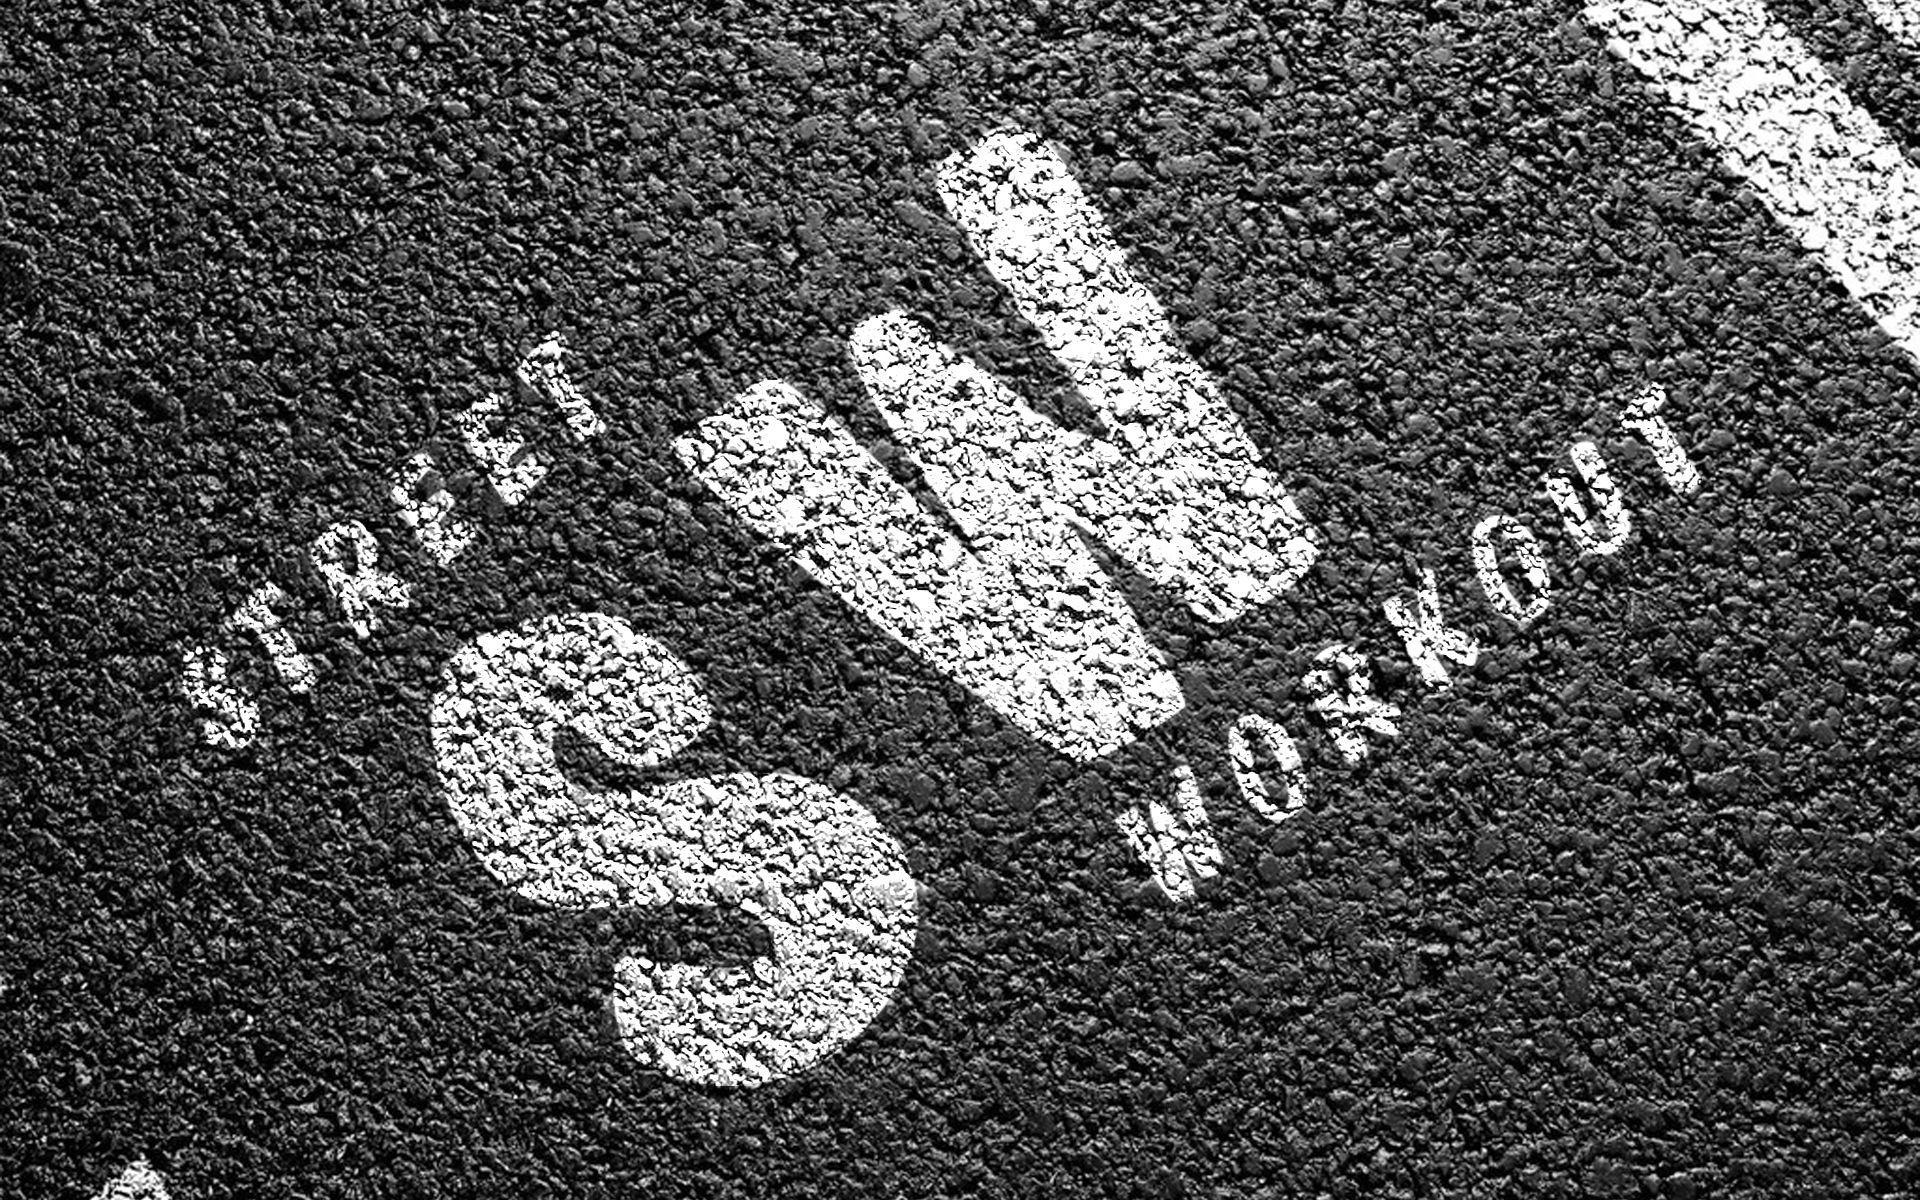 Street Workout Wallpapers - WallpaperSafari |Street Workout Wallpaper